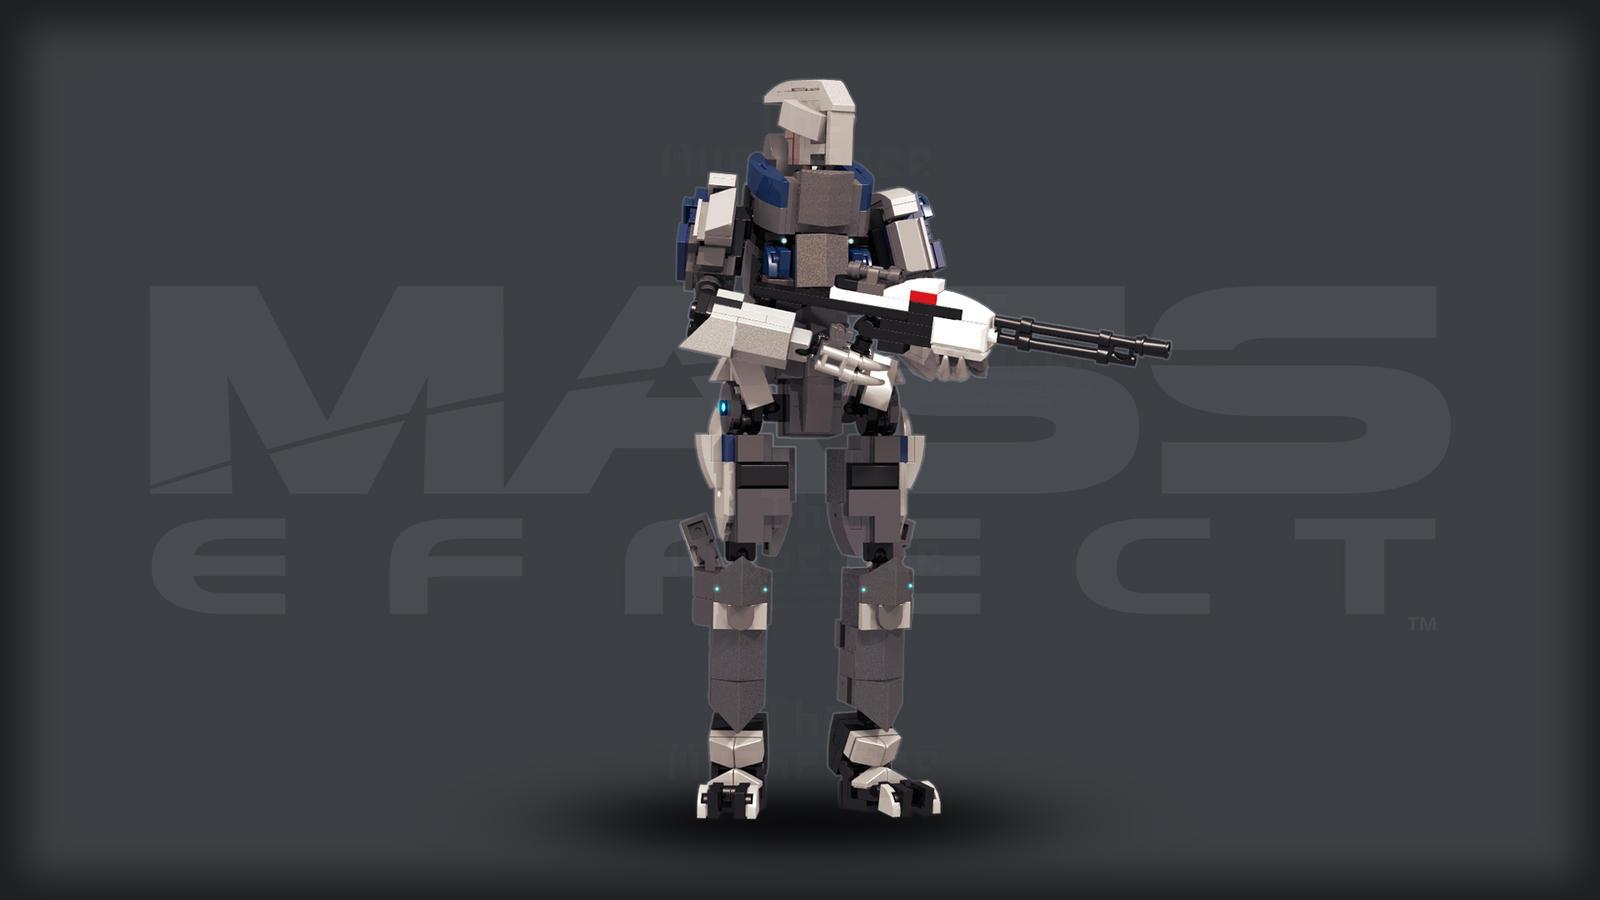 [Digital Commission] Garrus Vakarian (Mass Effect) by TheMugbearer